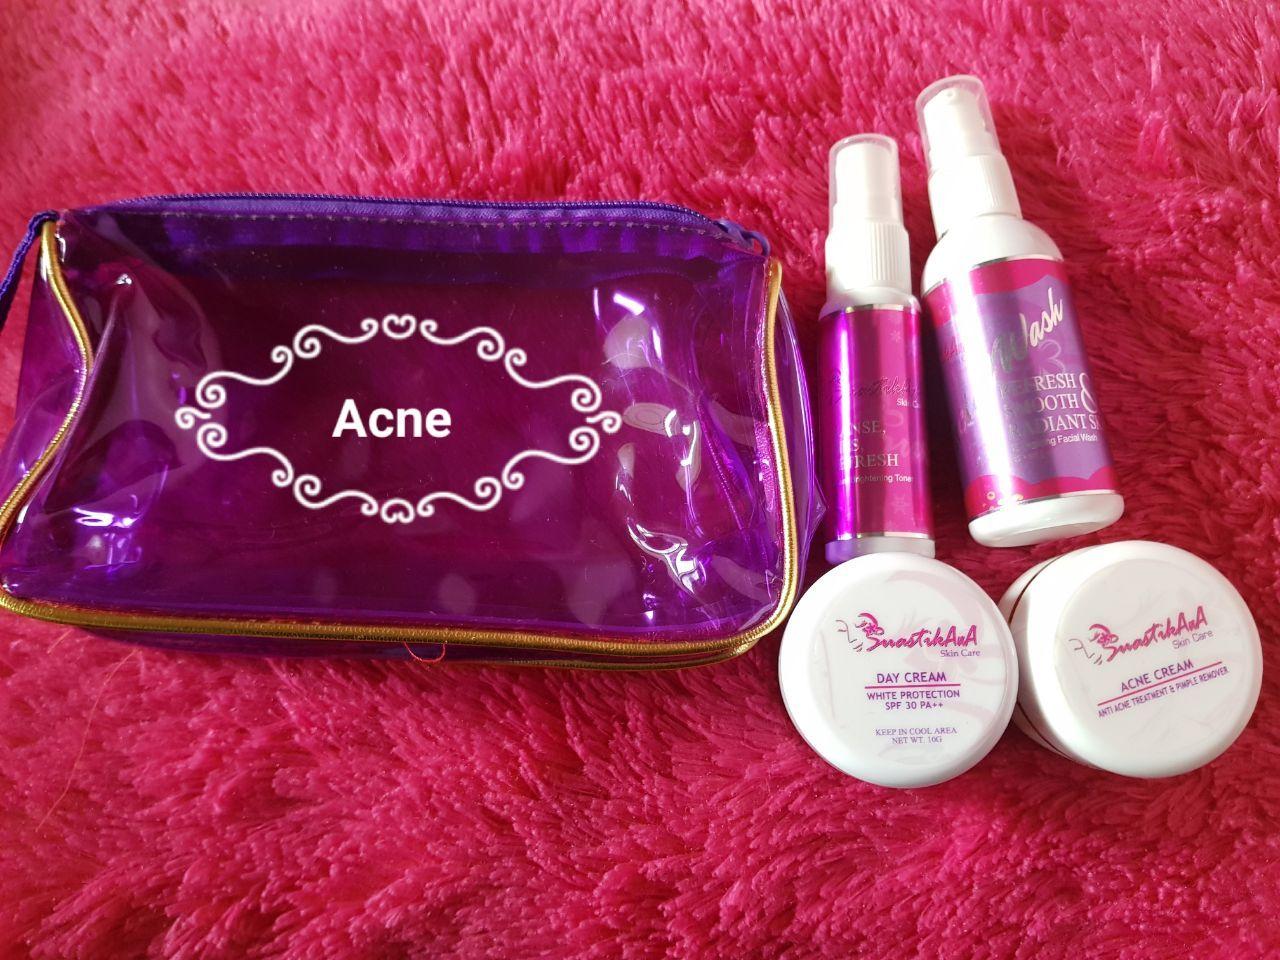 Acne Pro by Suastikana Skincare Cream Jerawat Produk